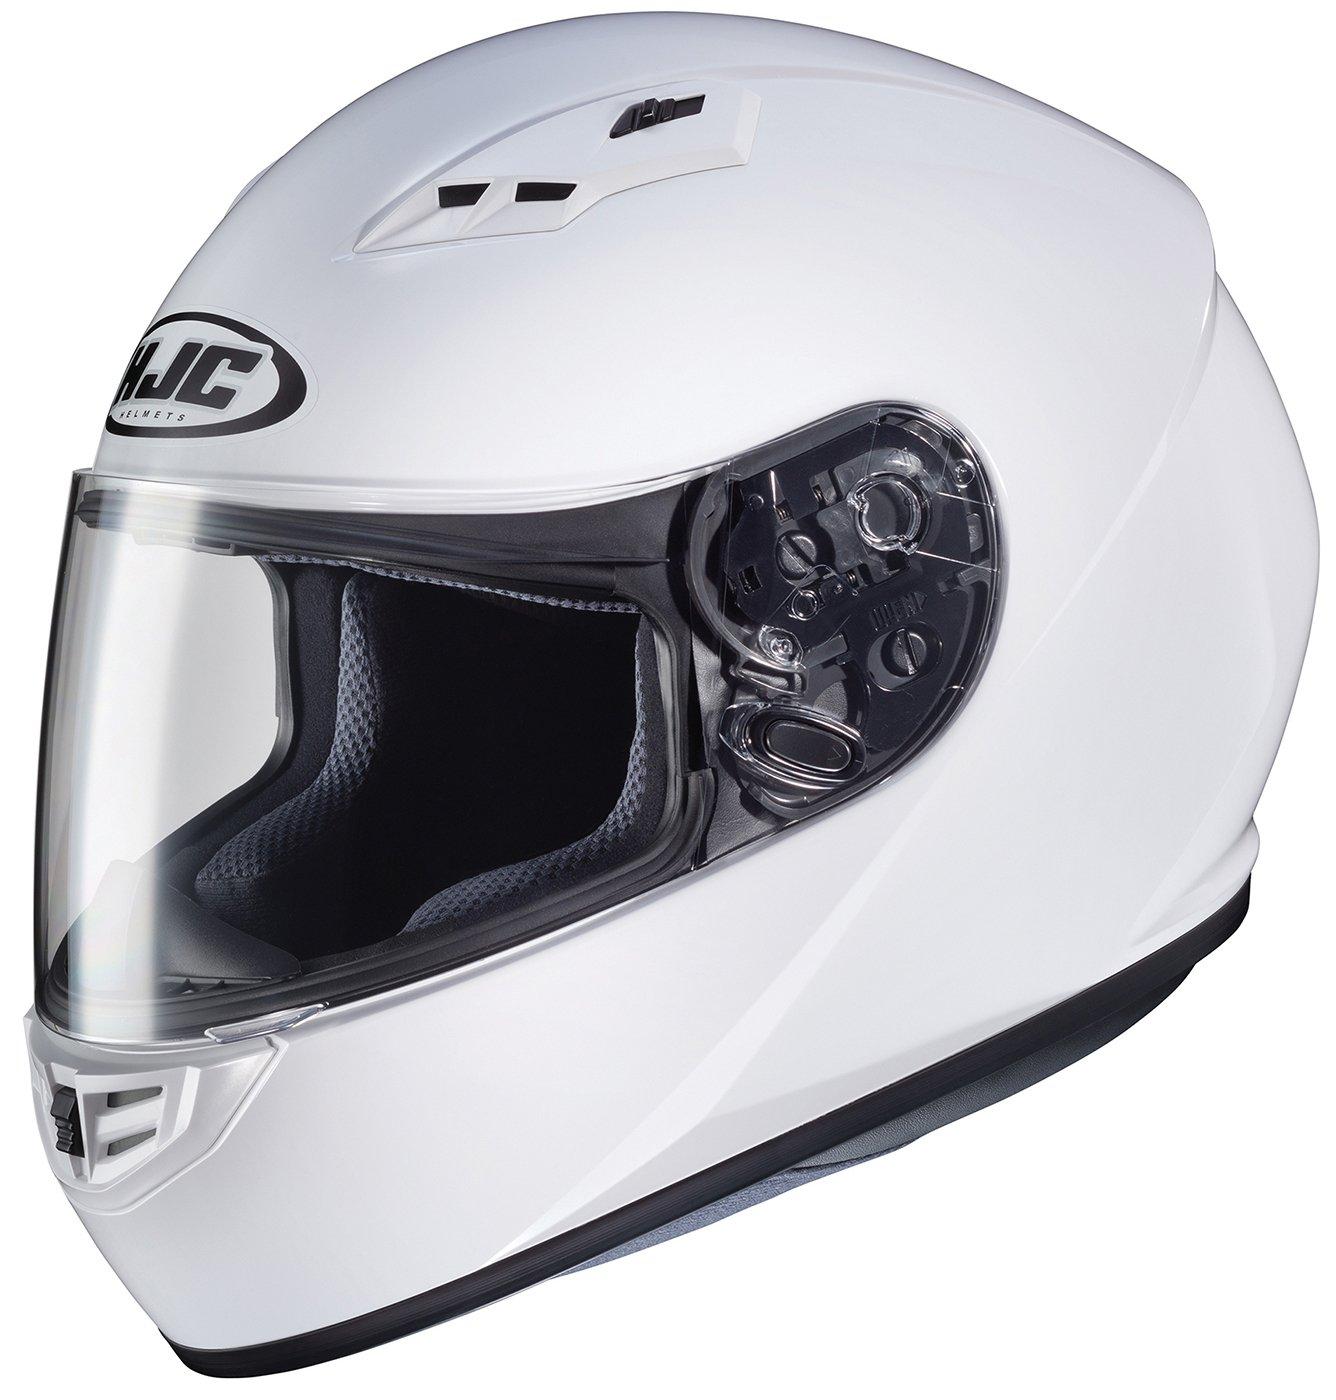 130-146 White, XX-Large HJC Helmets CS-R3 Unisex-Adult Full Face Solid Motorcycle Helmet